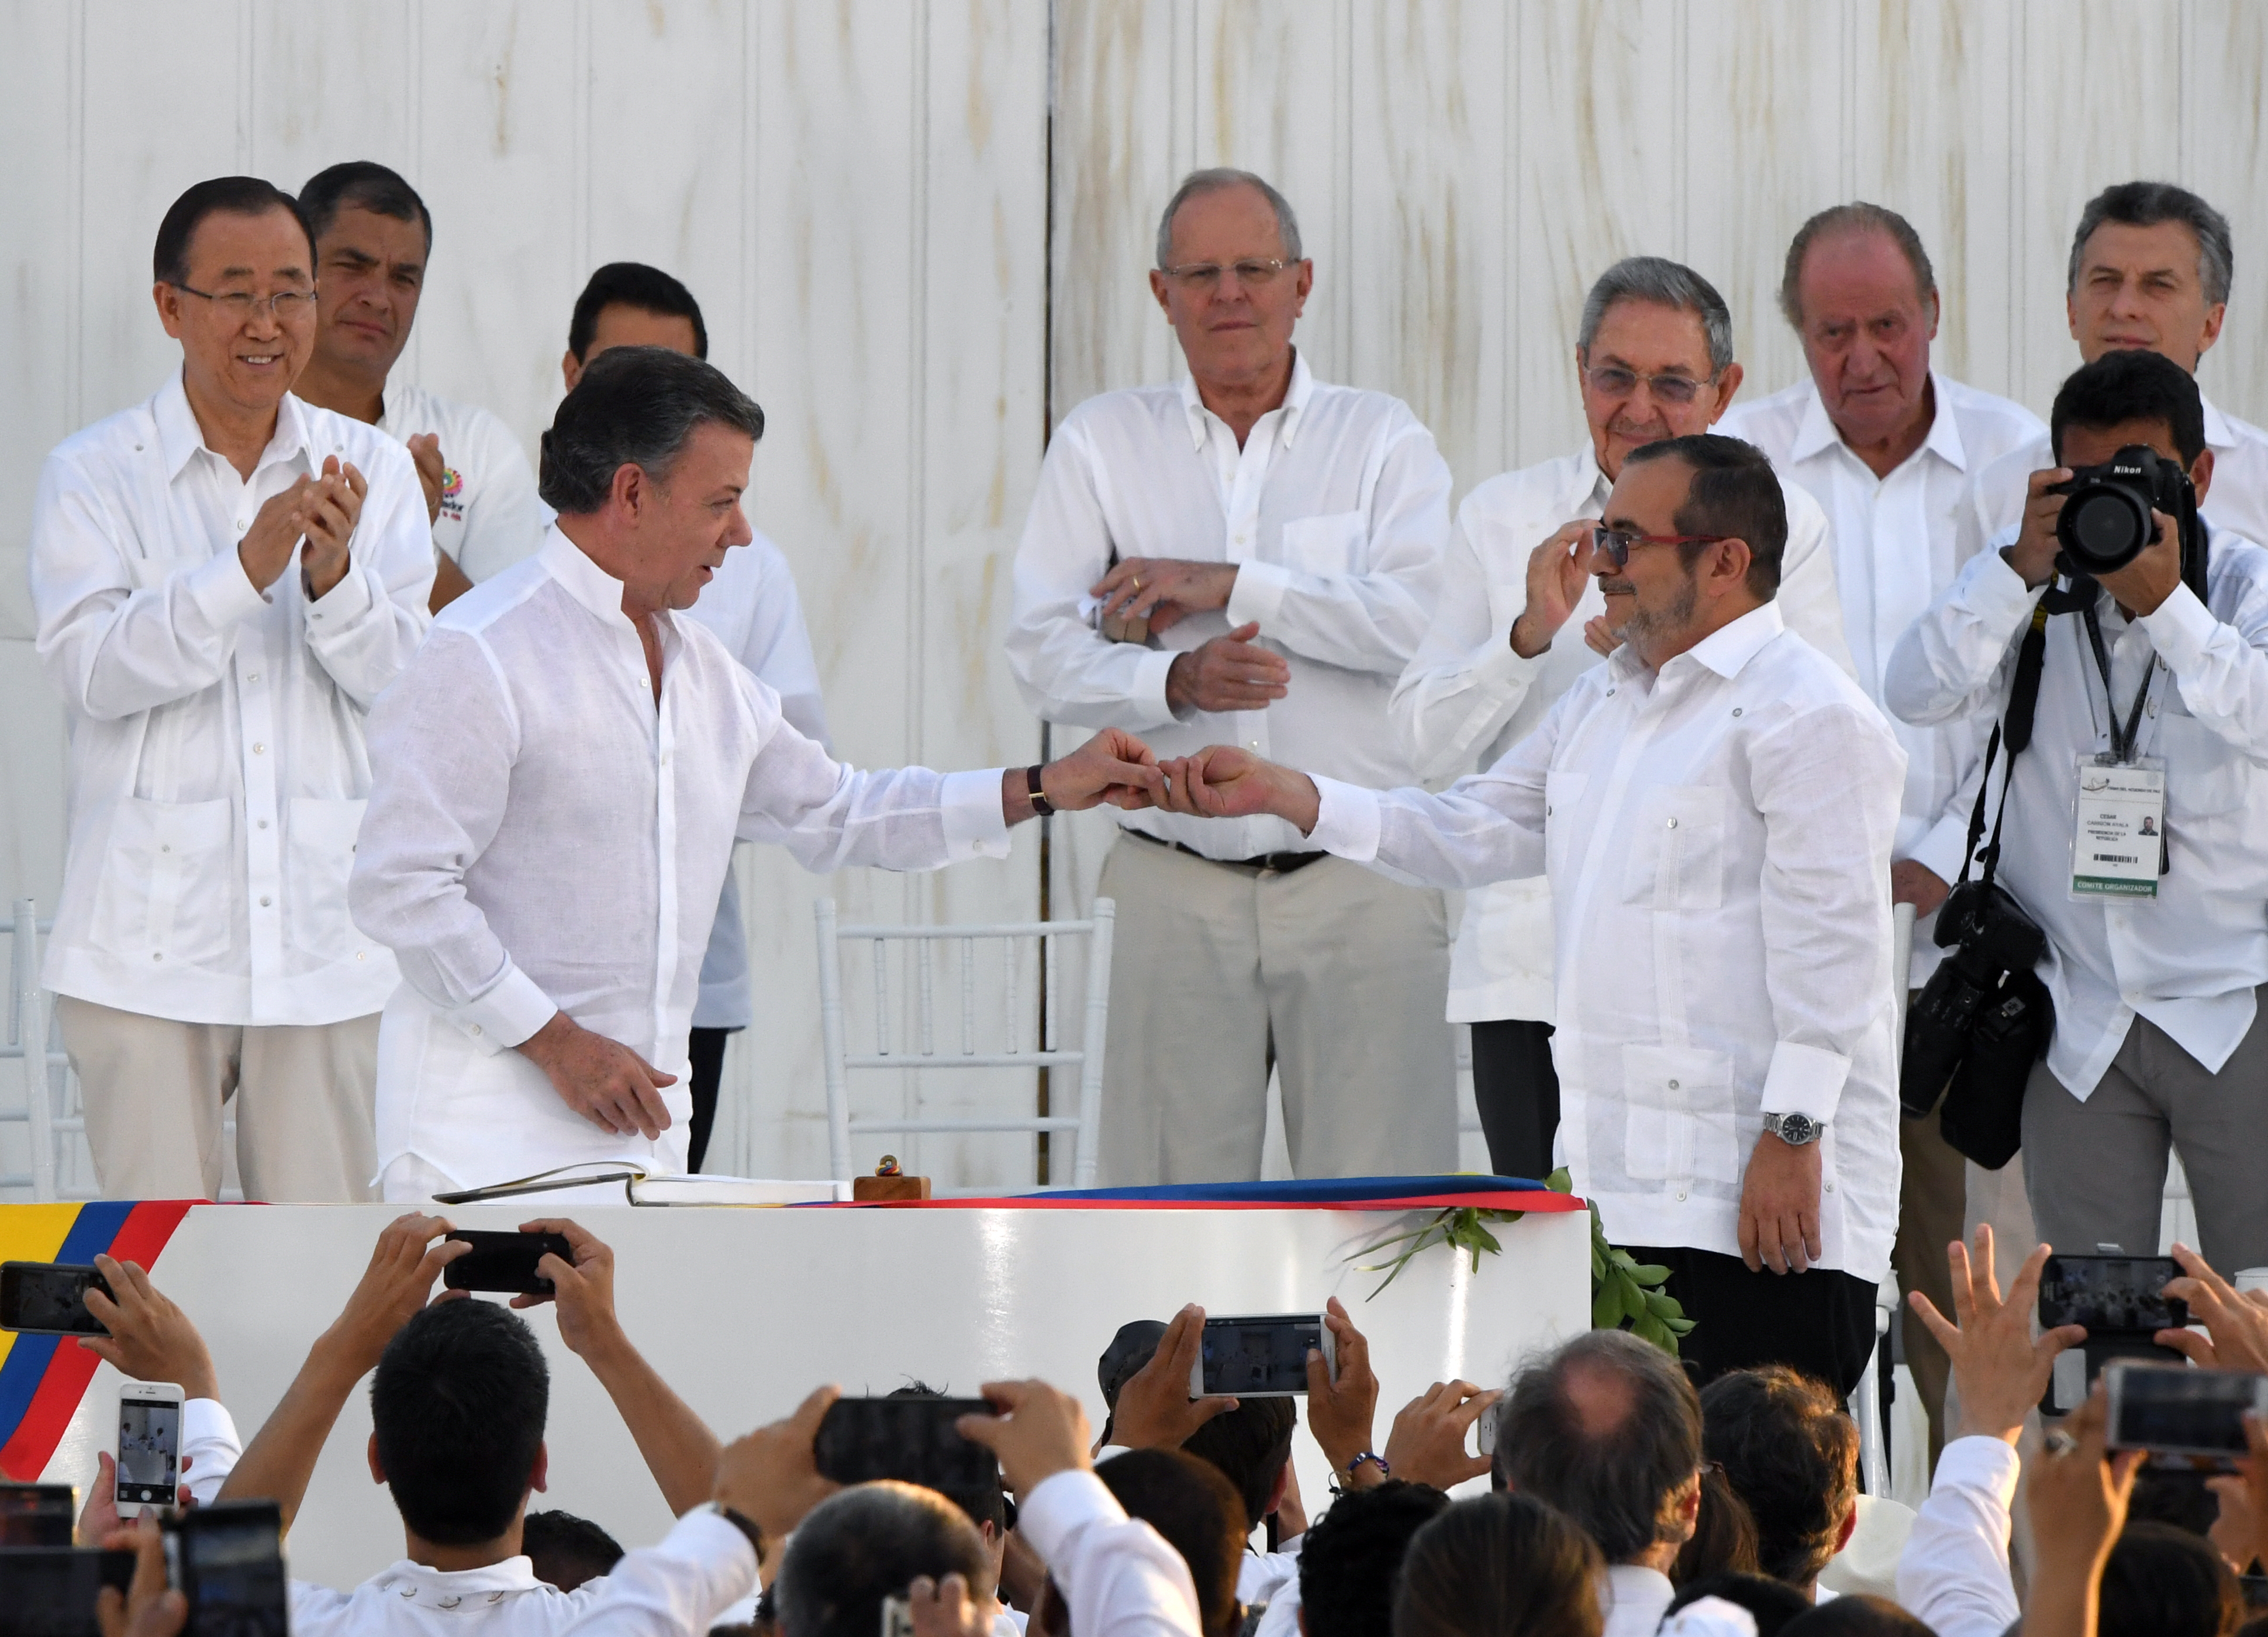 Katarzis Kolumbiában